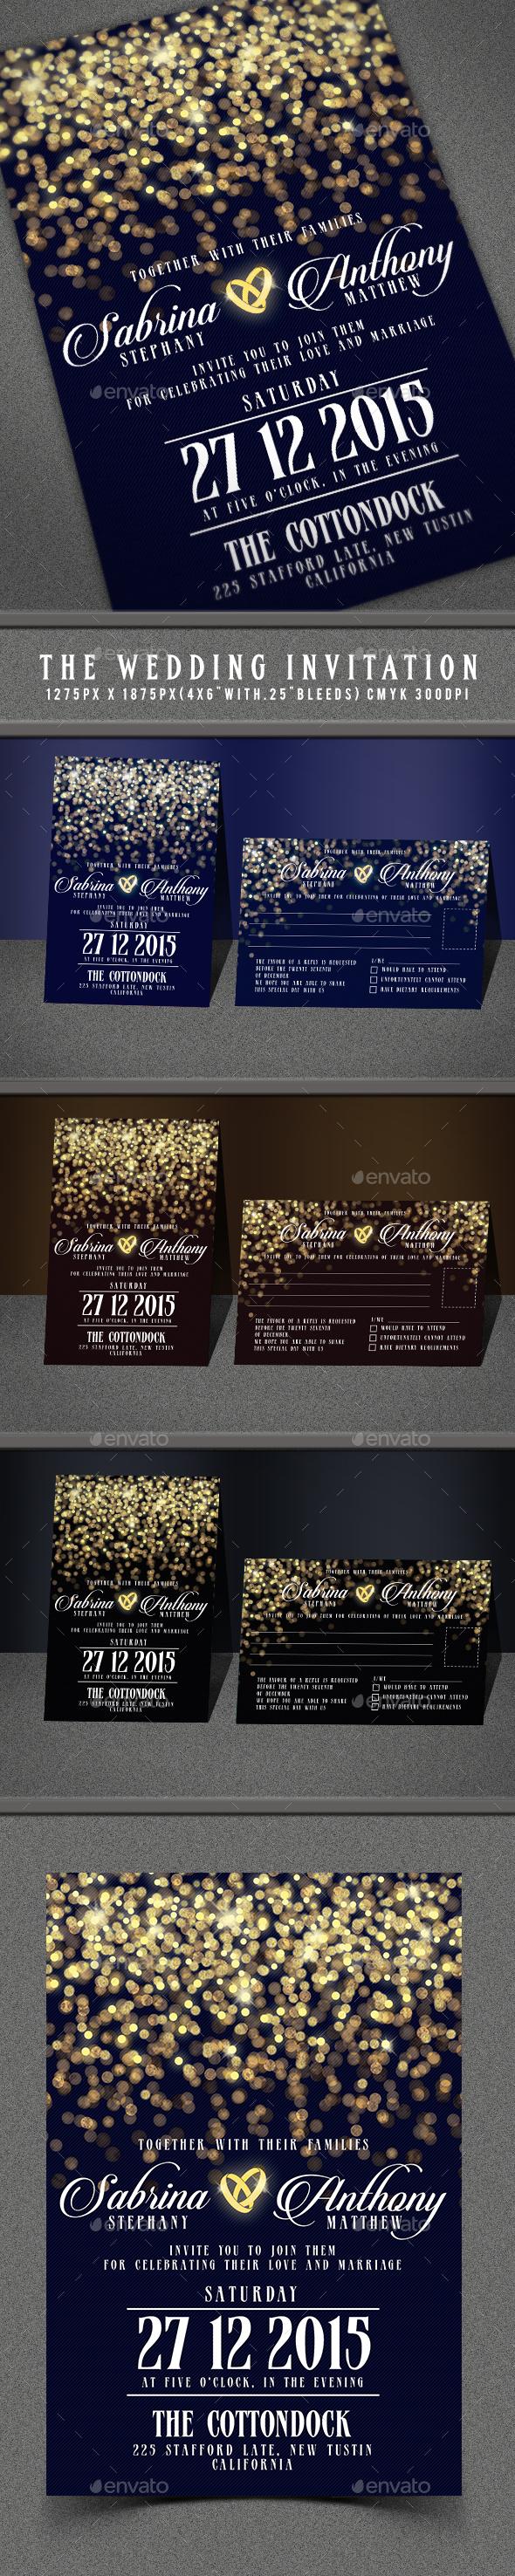 The Wedding Invitation - Invitations Cards & Invites